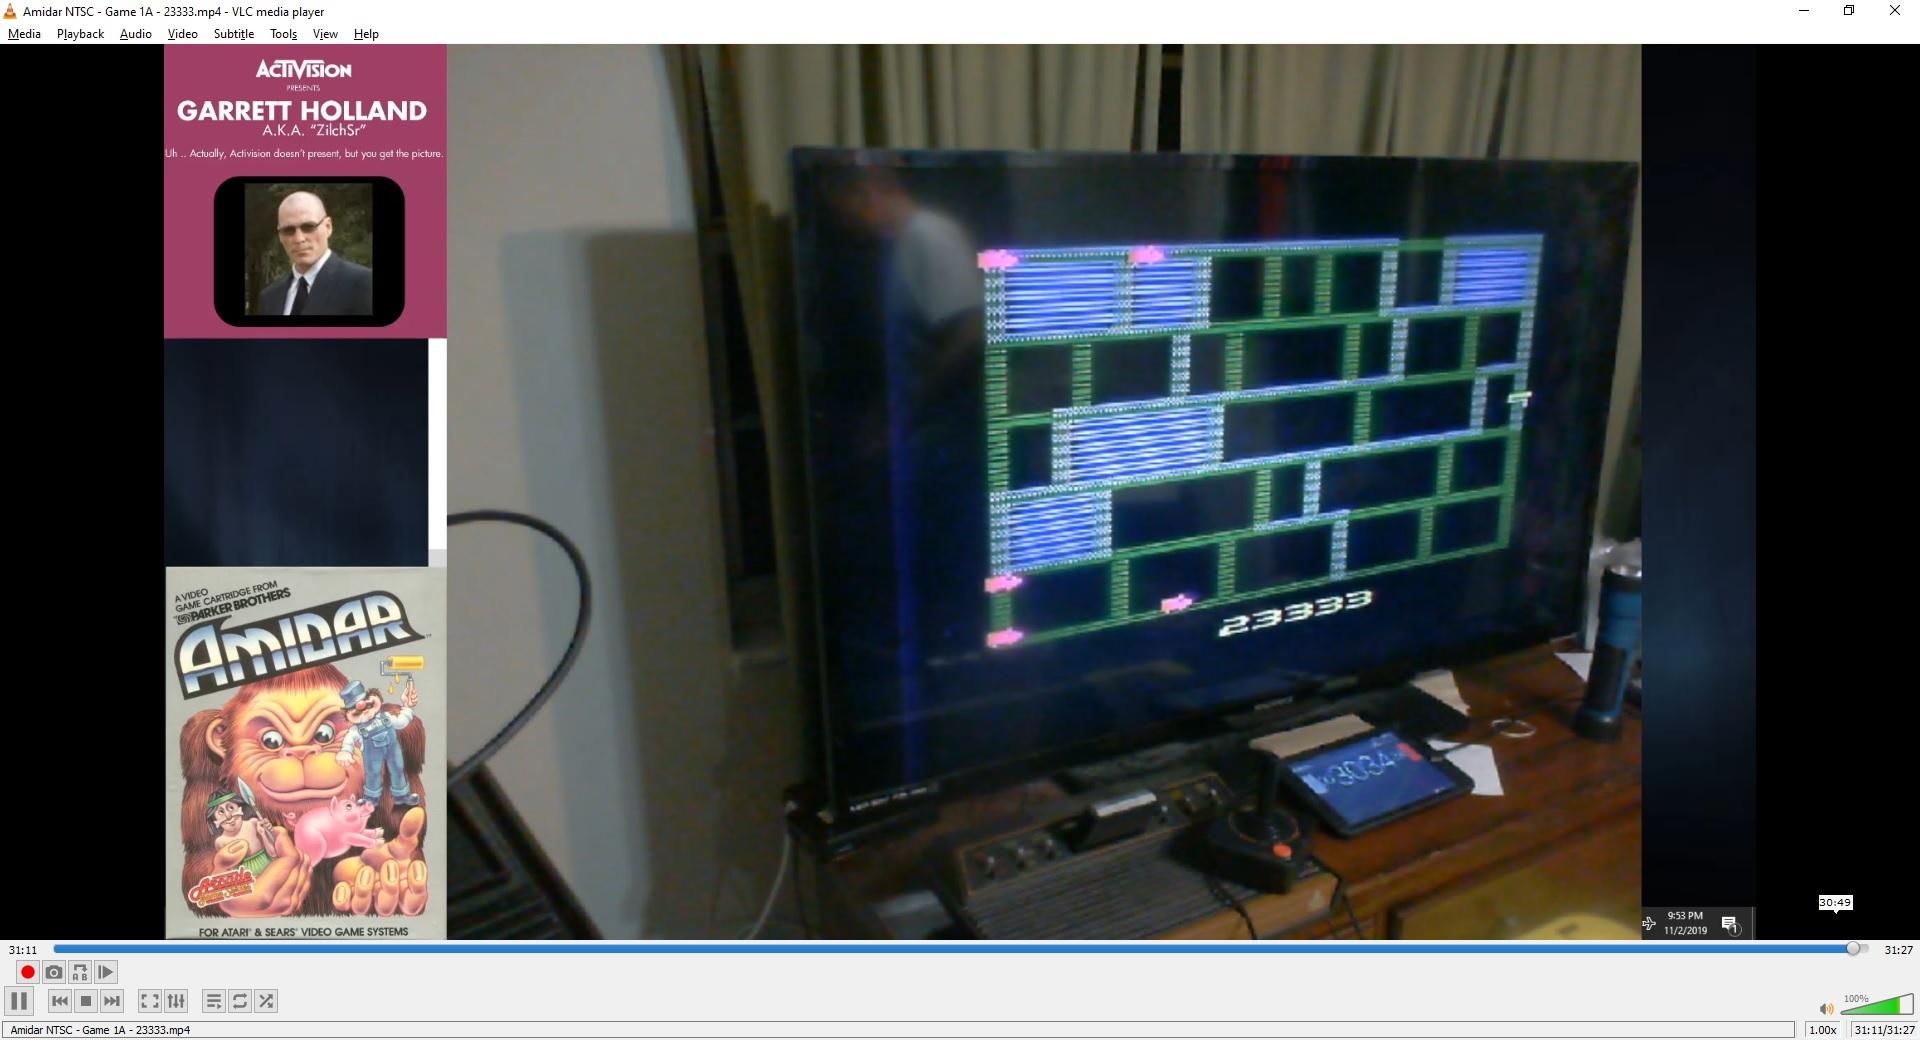 ZilchSr: Amidar (Atari 2600 Expert/A) 23,333 points on 2019-11-03 14:42:51